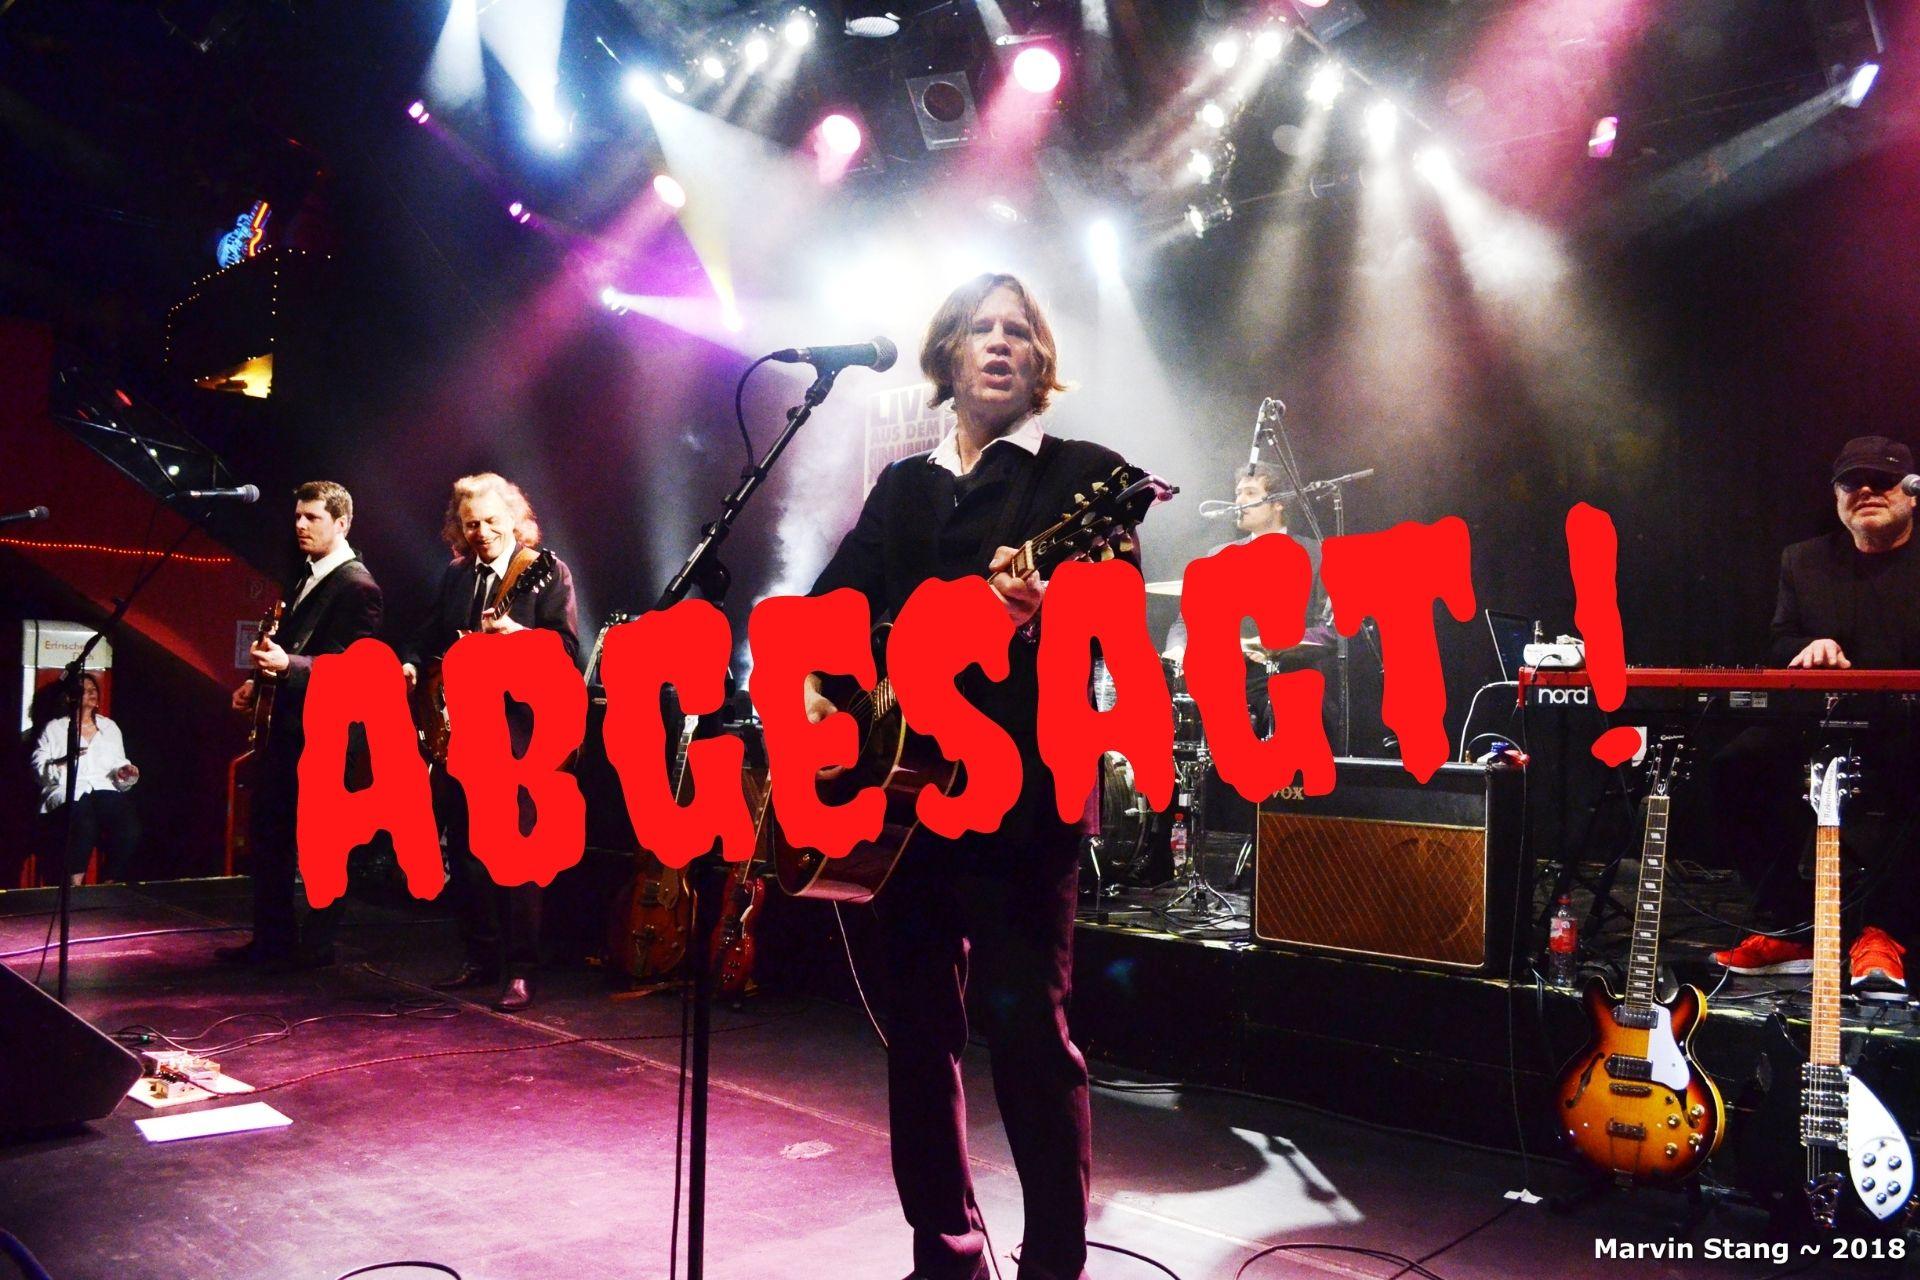 ABGESAGT / Beatles Revival Band NEU